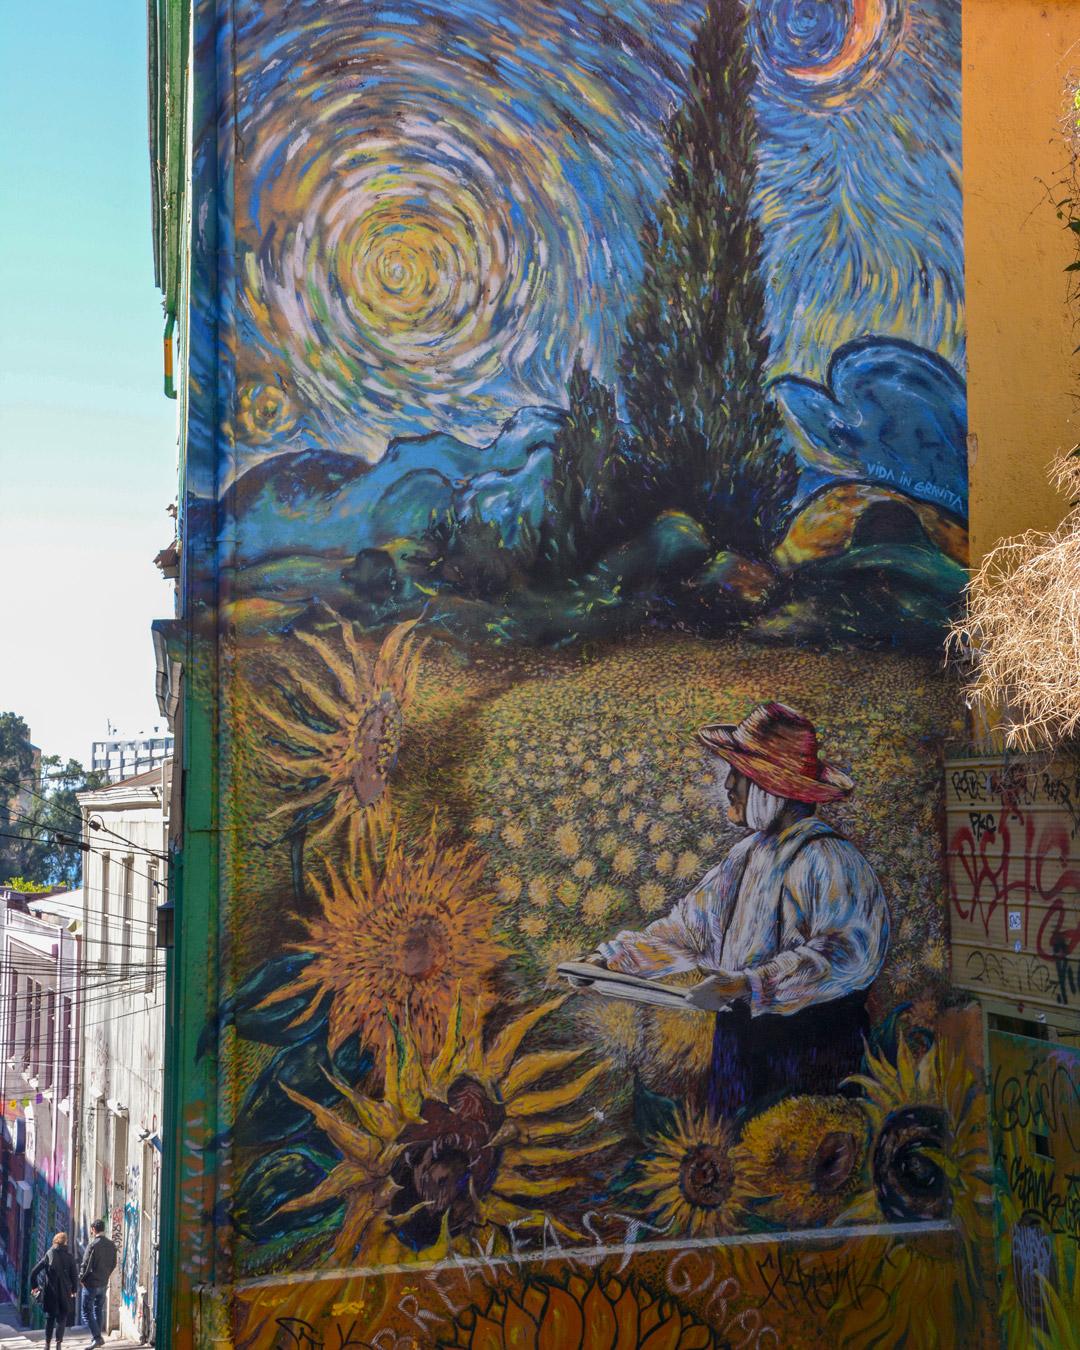 Van Gogh En Peinture Murale à Valparaiso